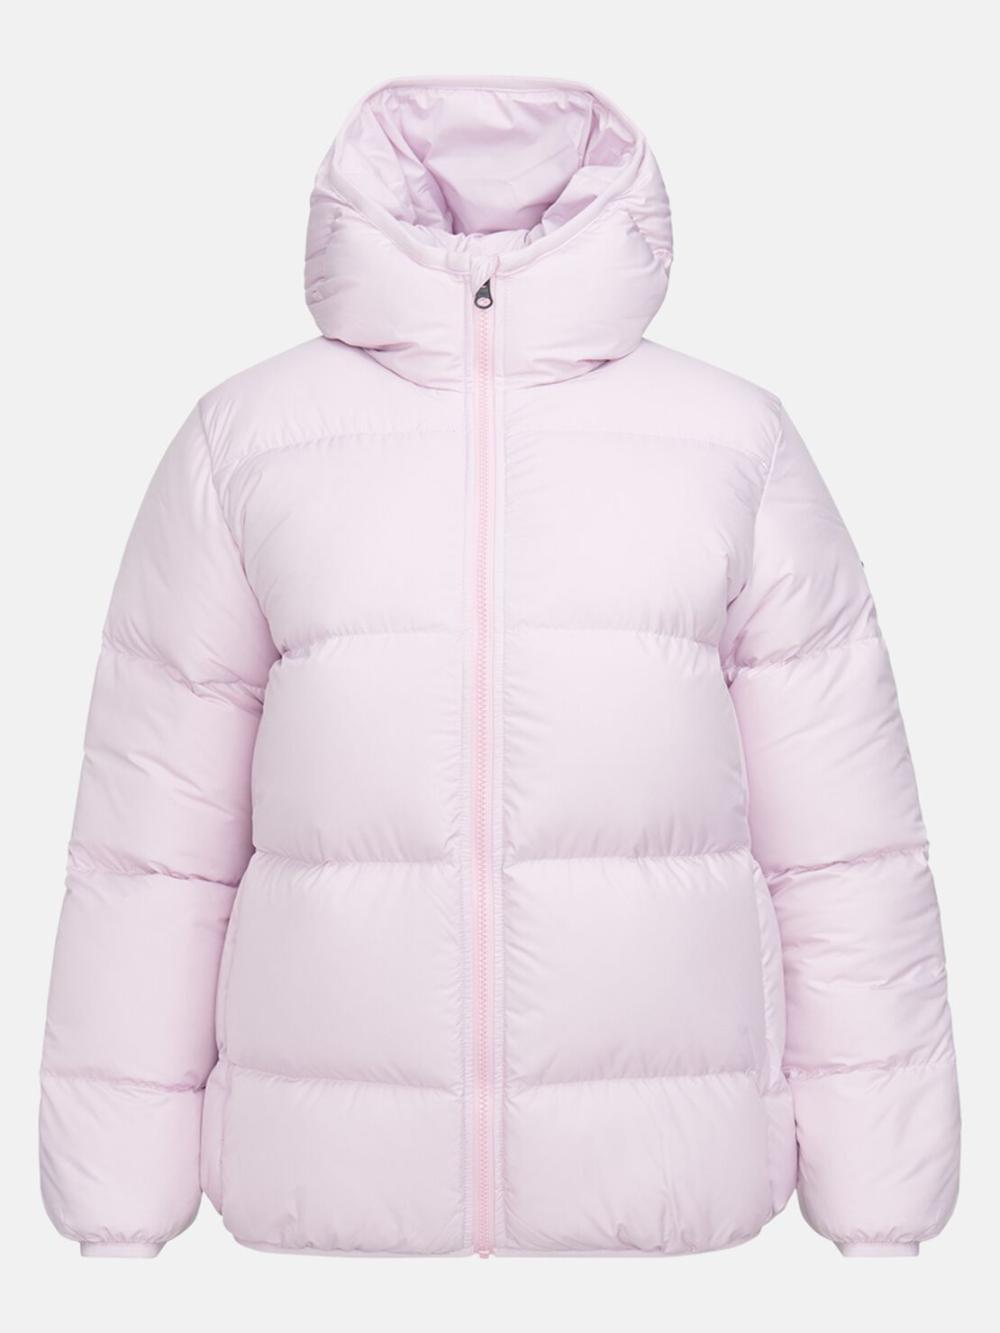 Rivel Puffer Women Cold Blush Peak Performance Puffer Jacket Women Puffer Puffer Jackets [ 1333 x 1000 Pixel ]